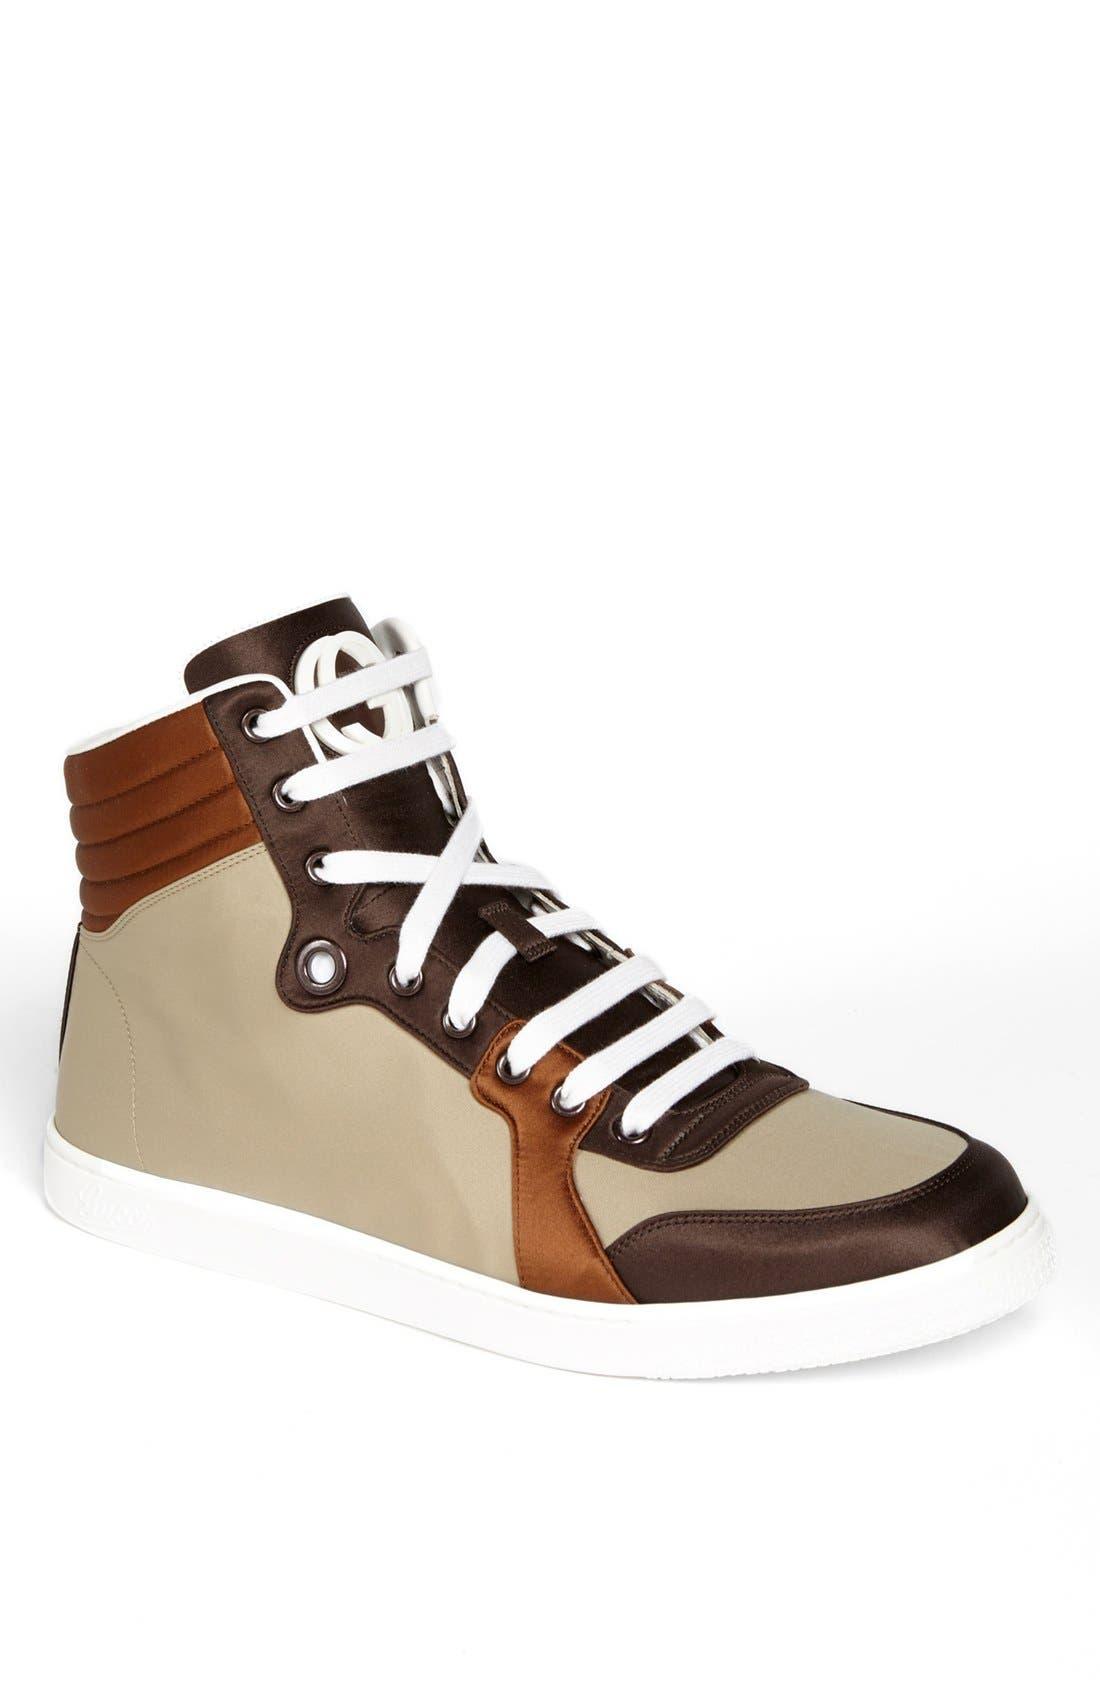 Main Image - Gucci 'Coda' Satin High Top Sneaker